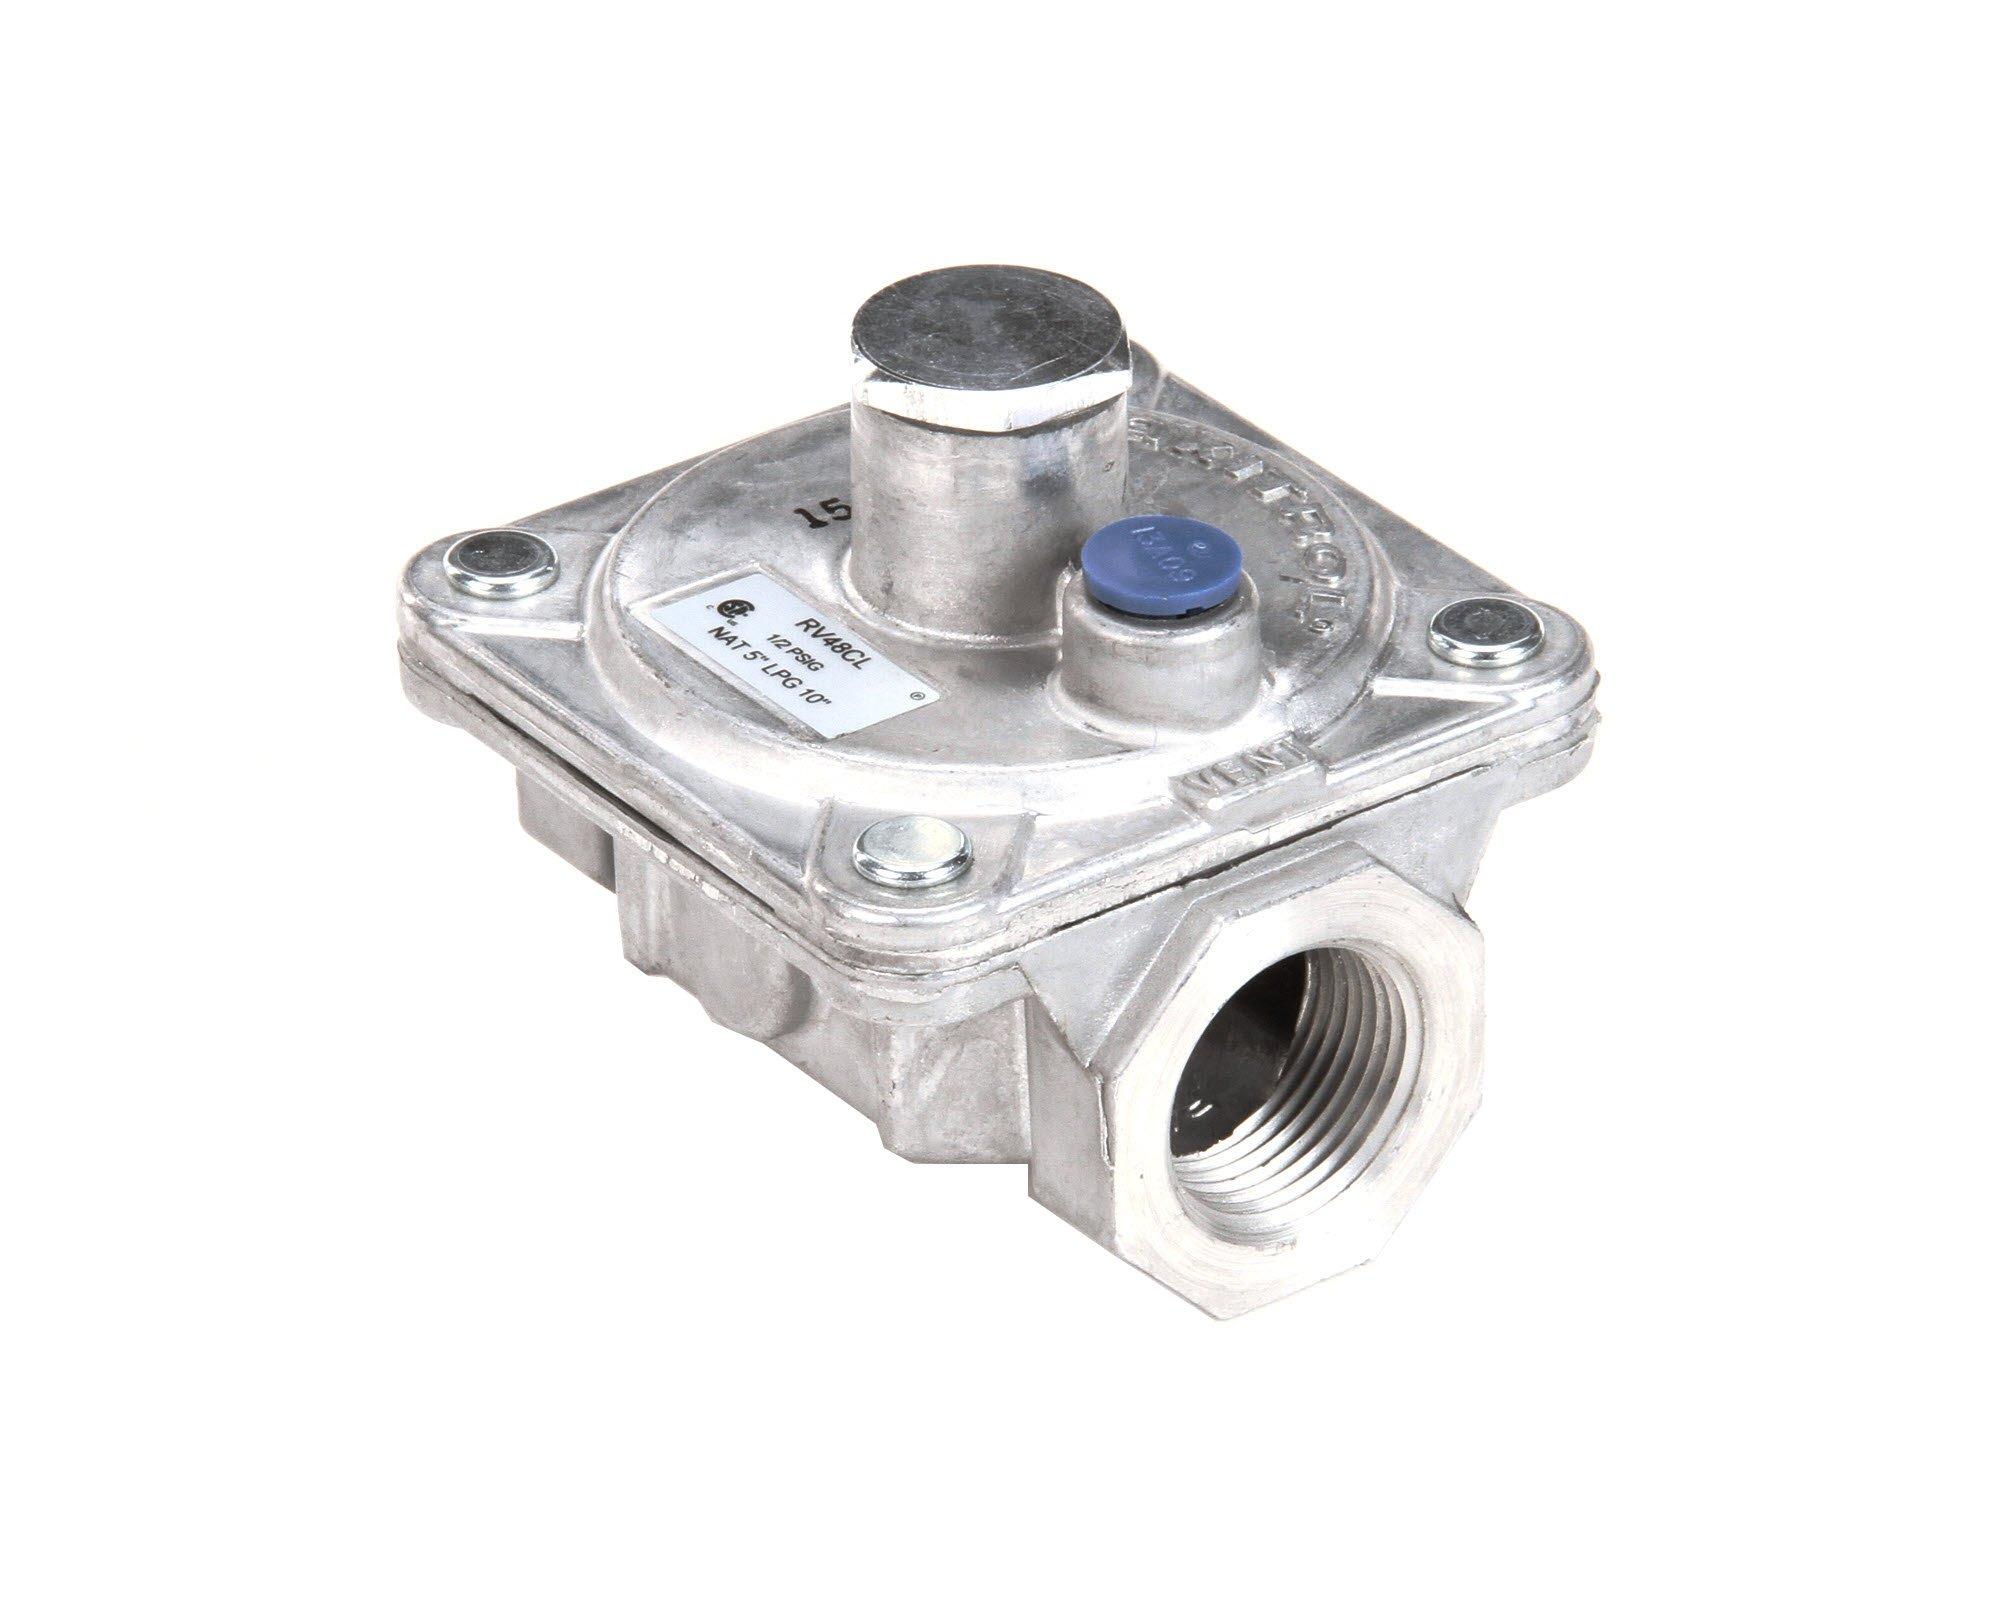 Dormont RV48CL-32 Convertible Regulator Gas 1/2-inch